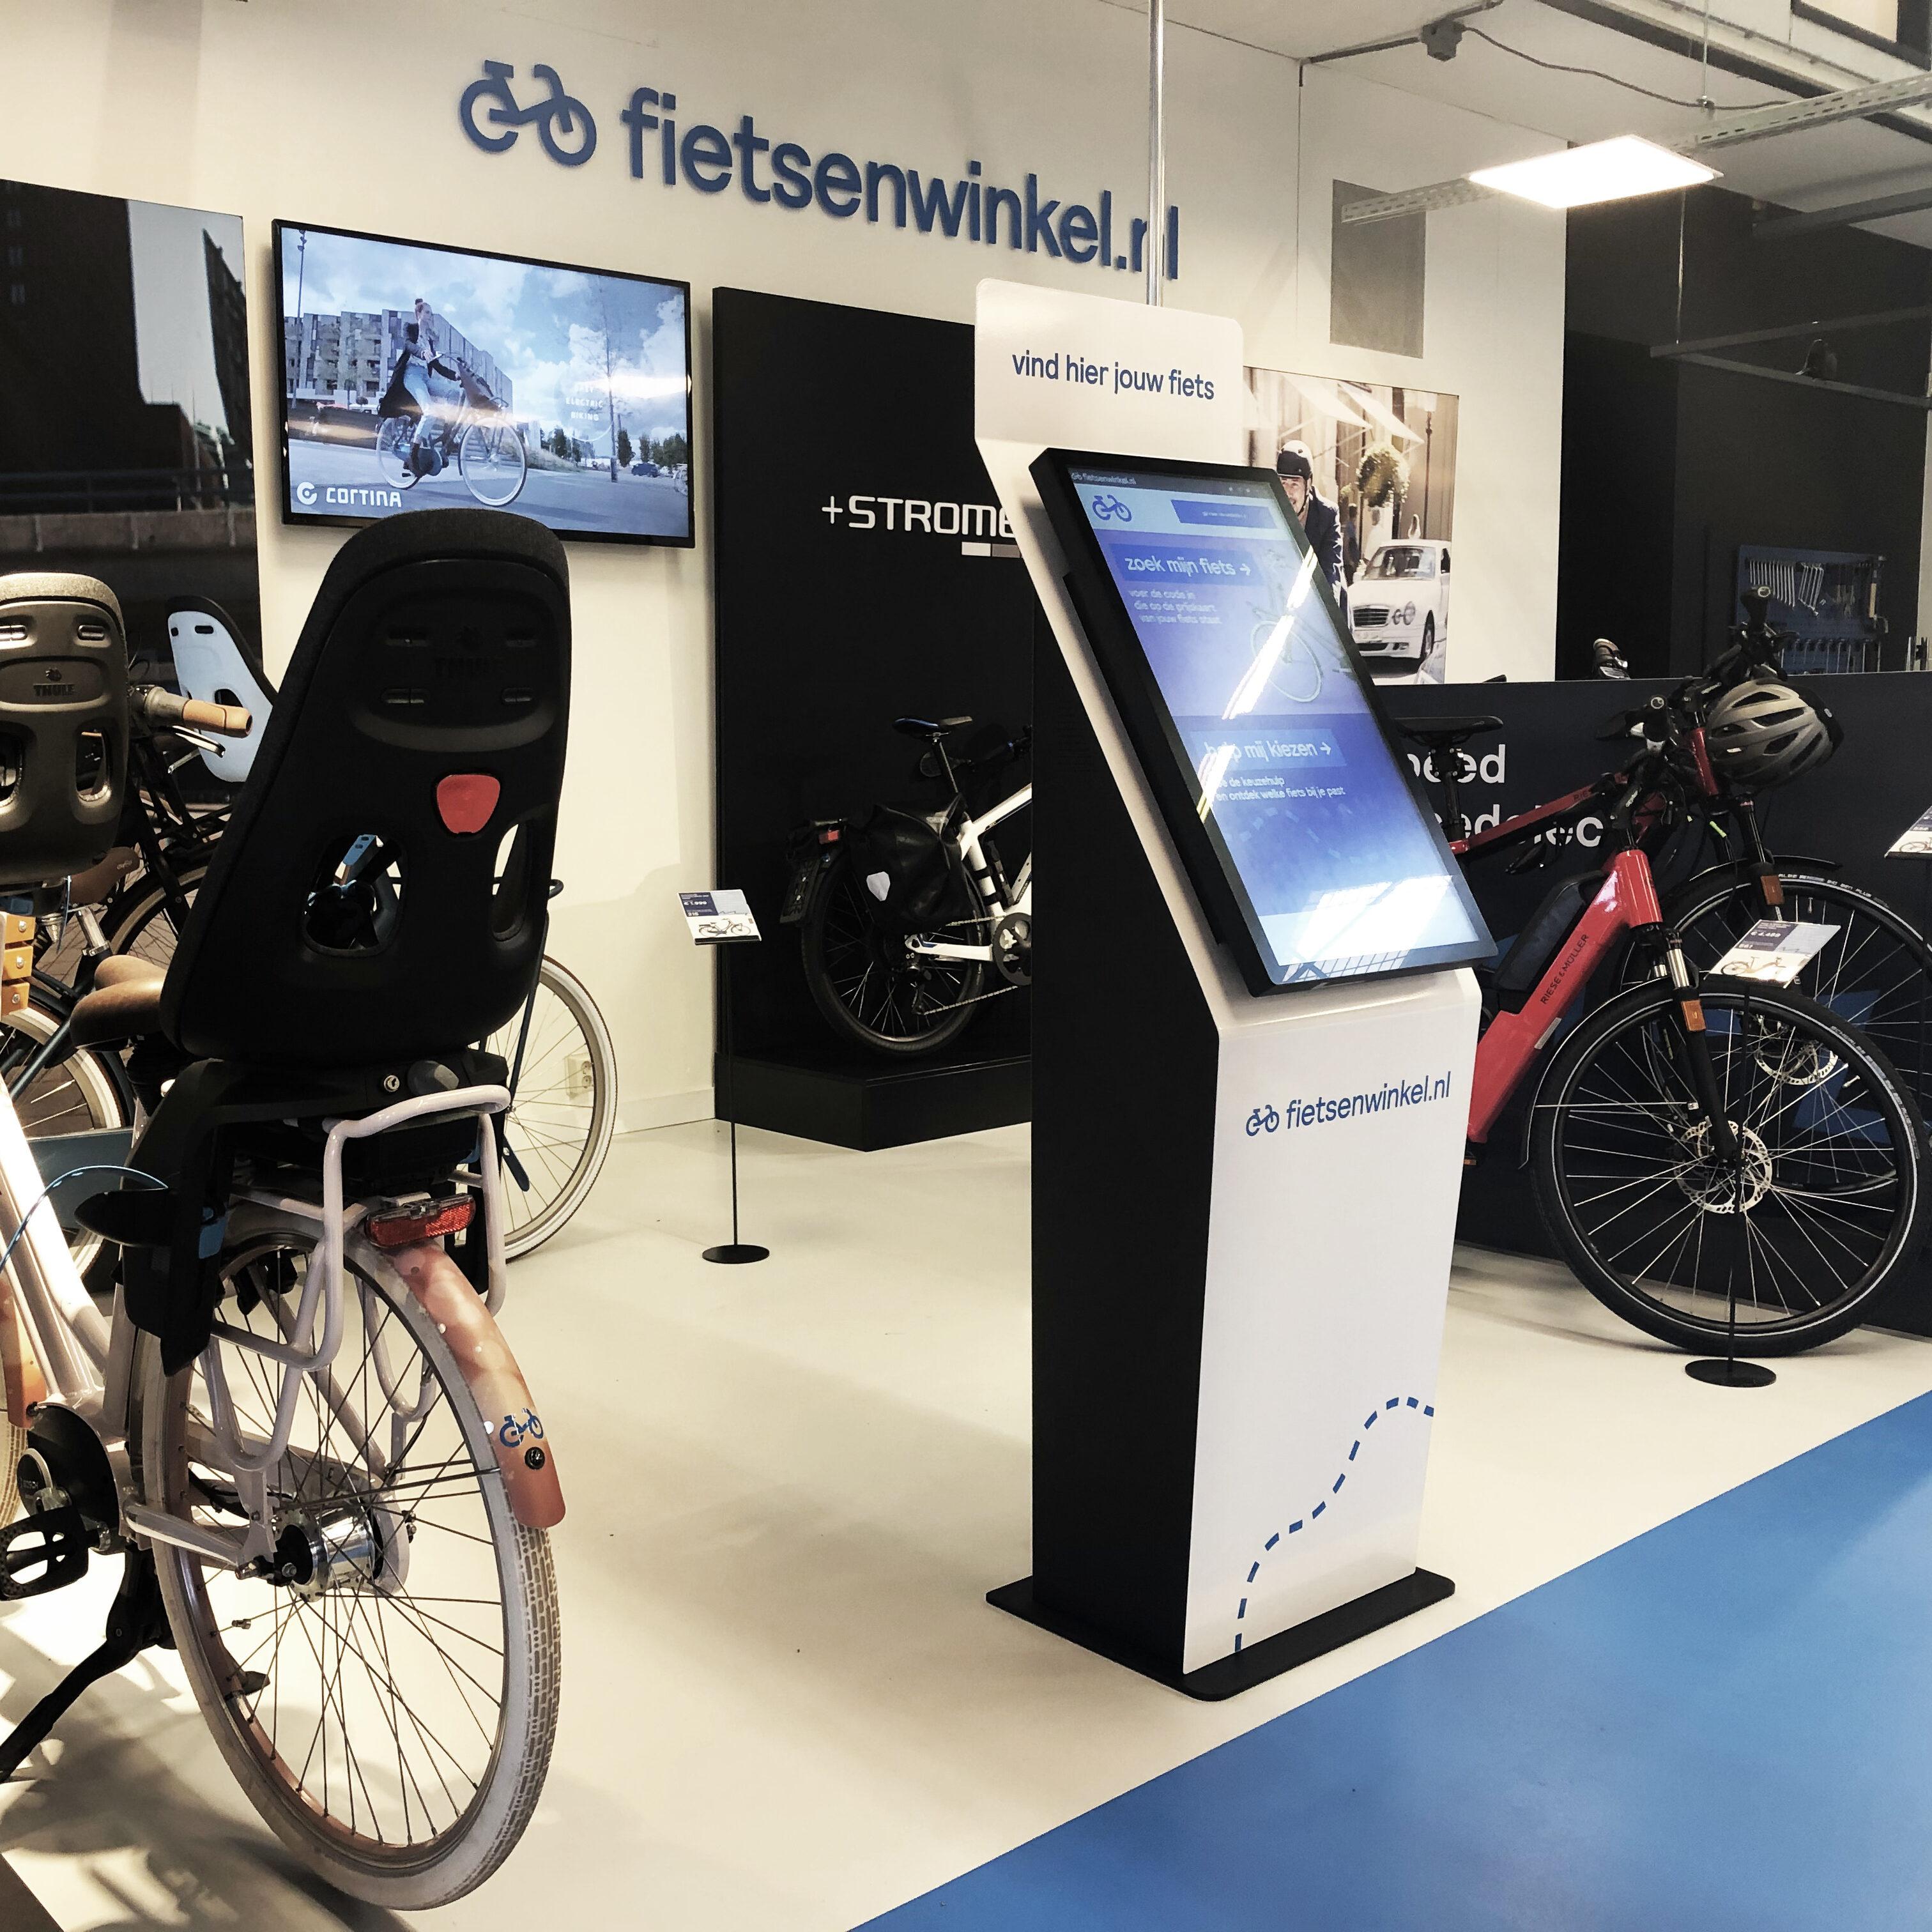 diz1632P kiosk in a bike shop